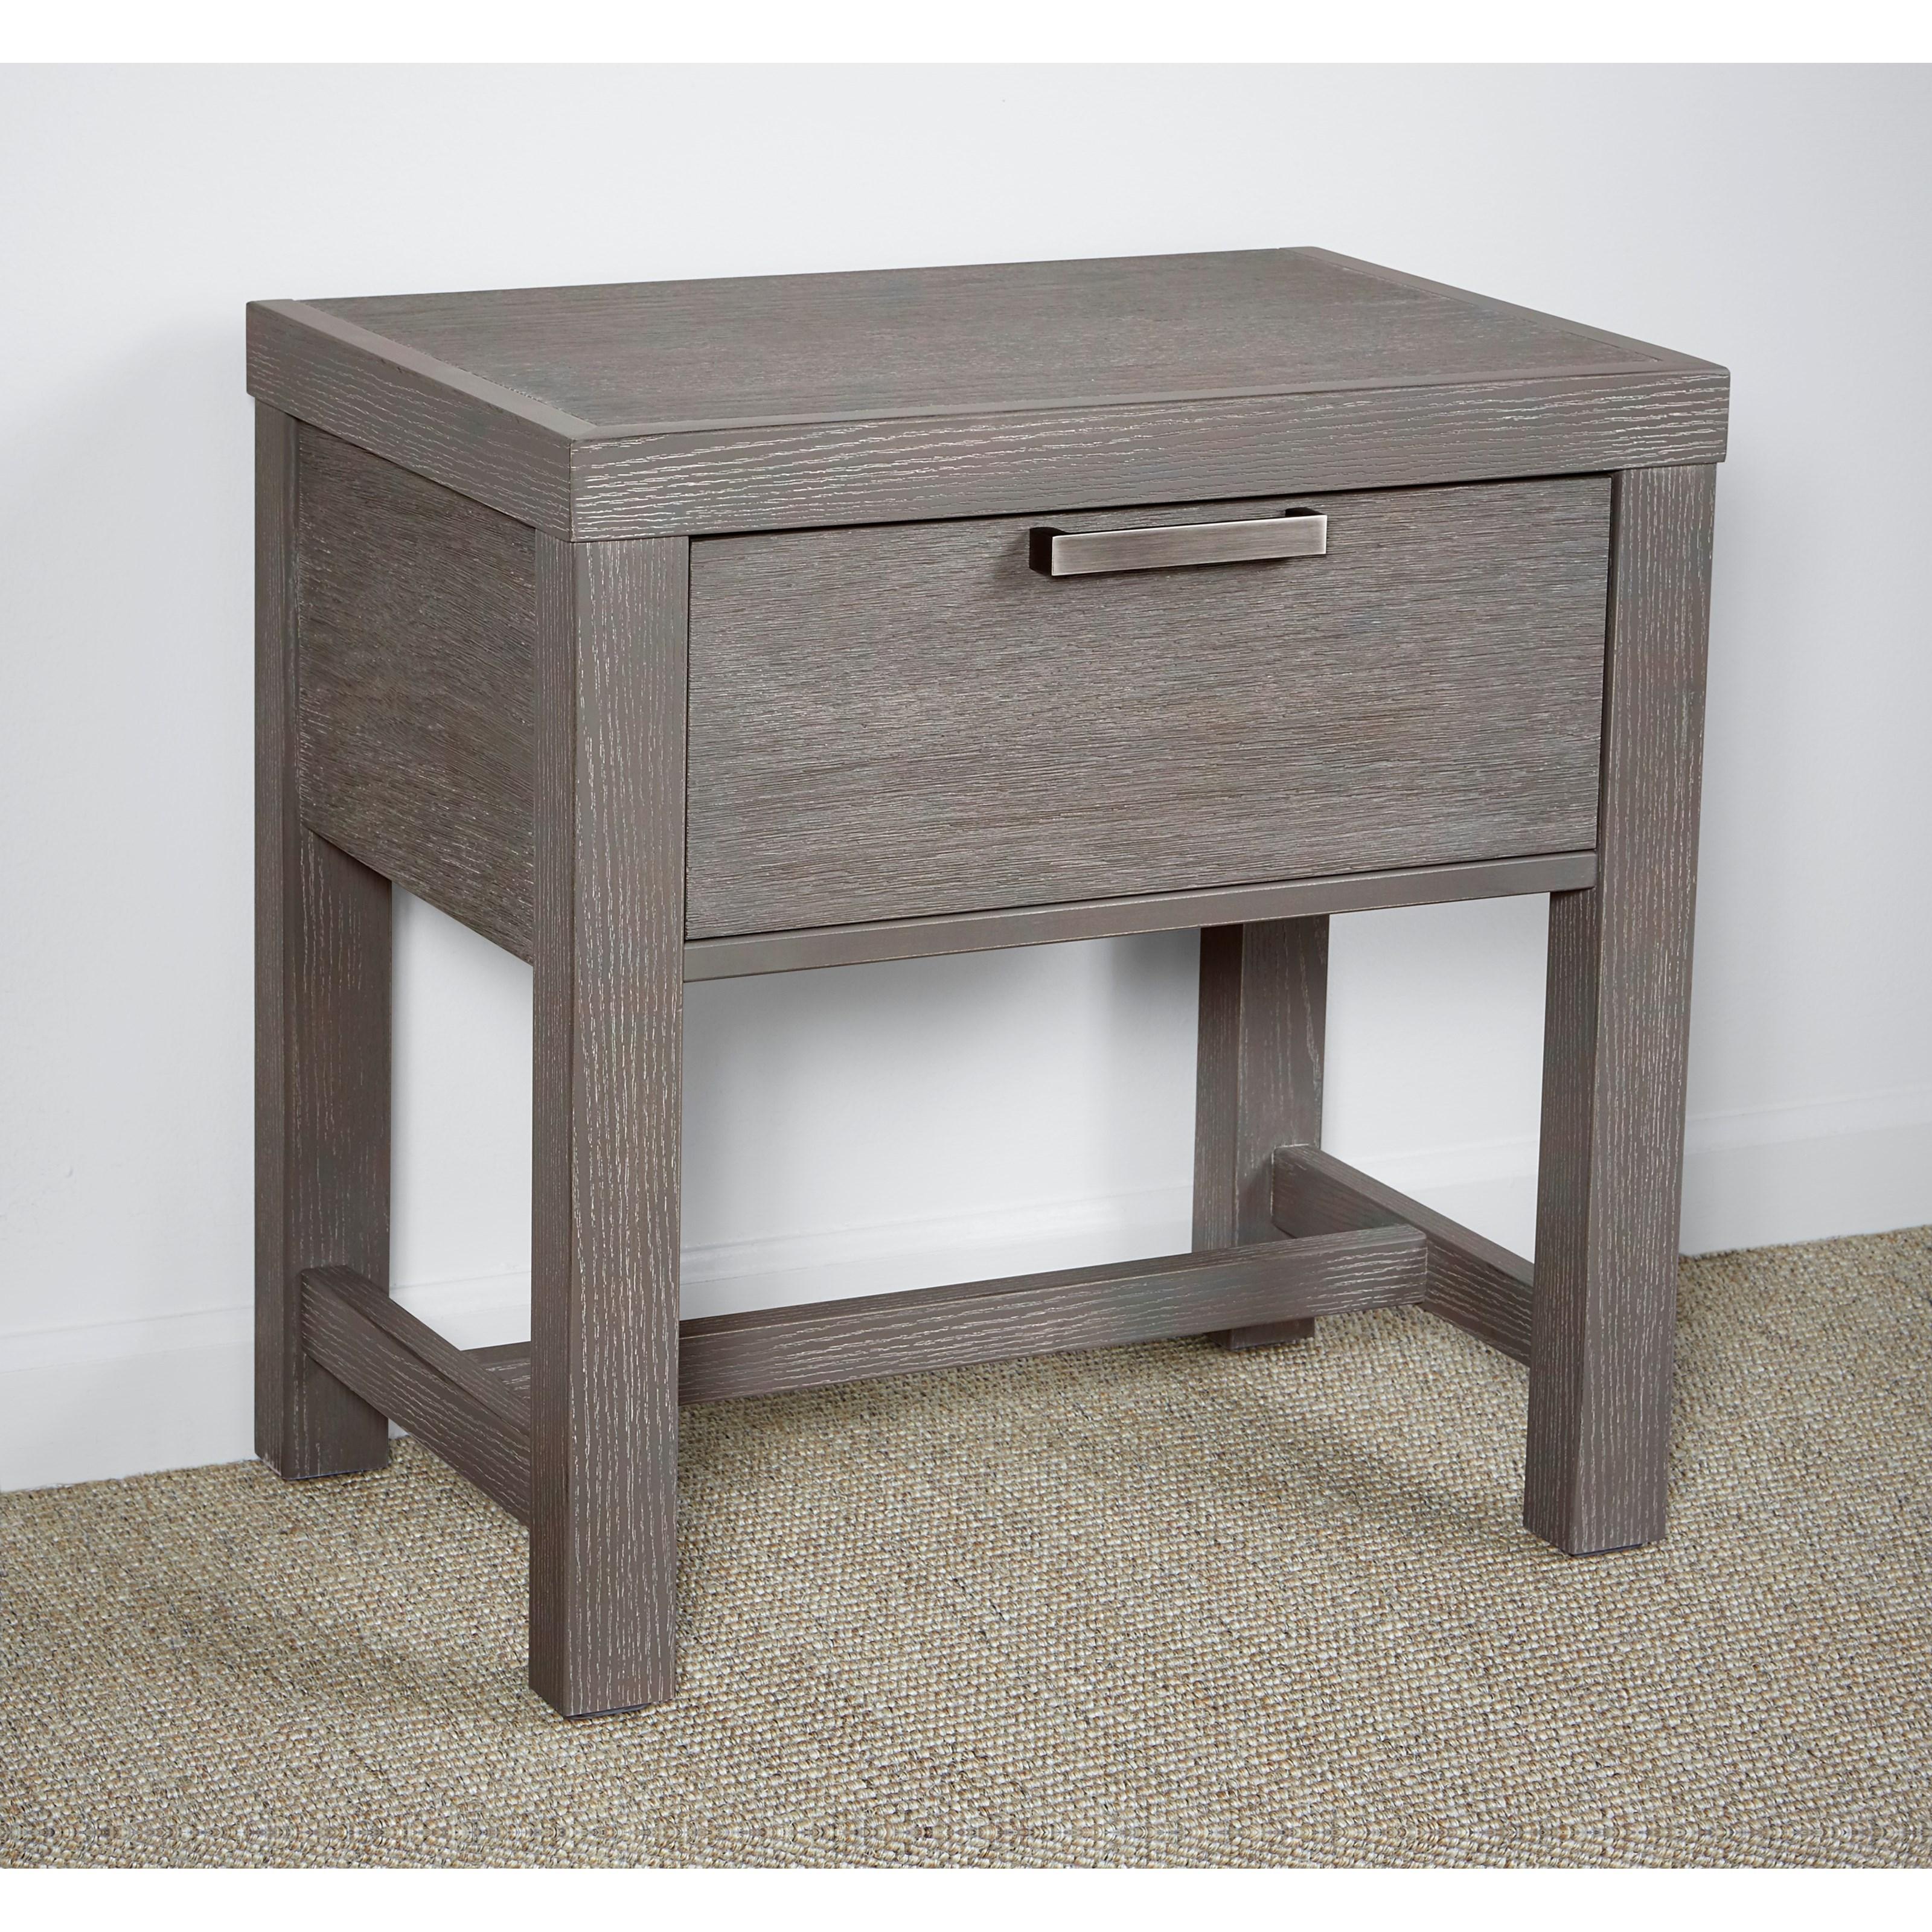 Vaughan Bassett American Modern Bedside Table 1 Drawer W